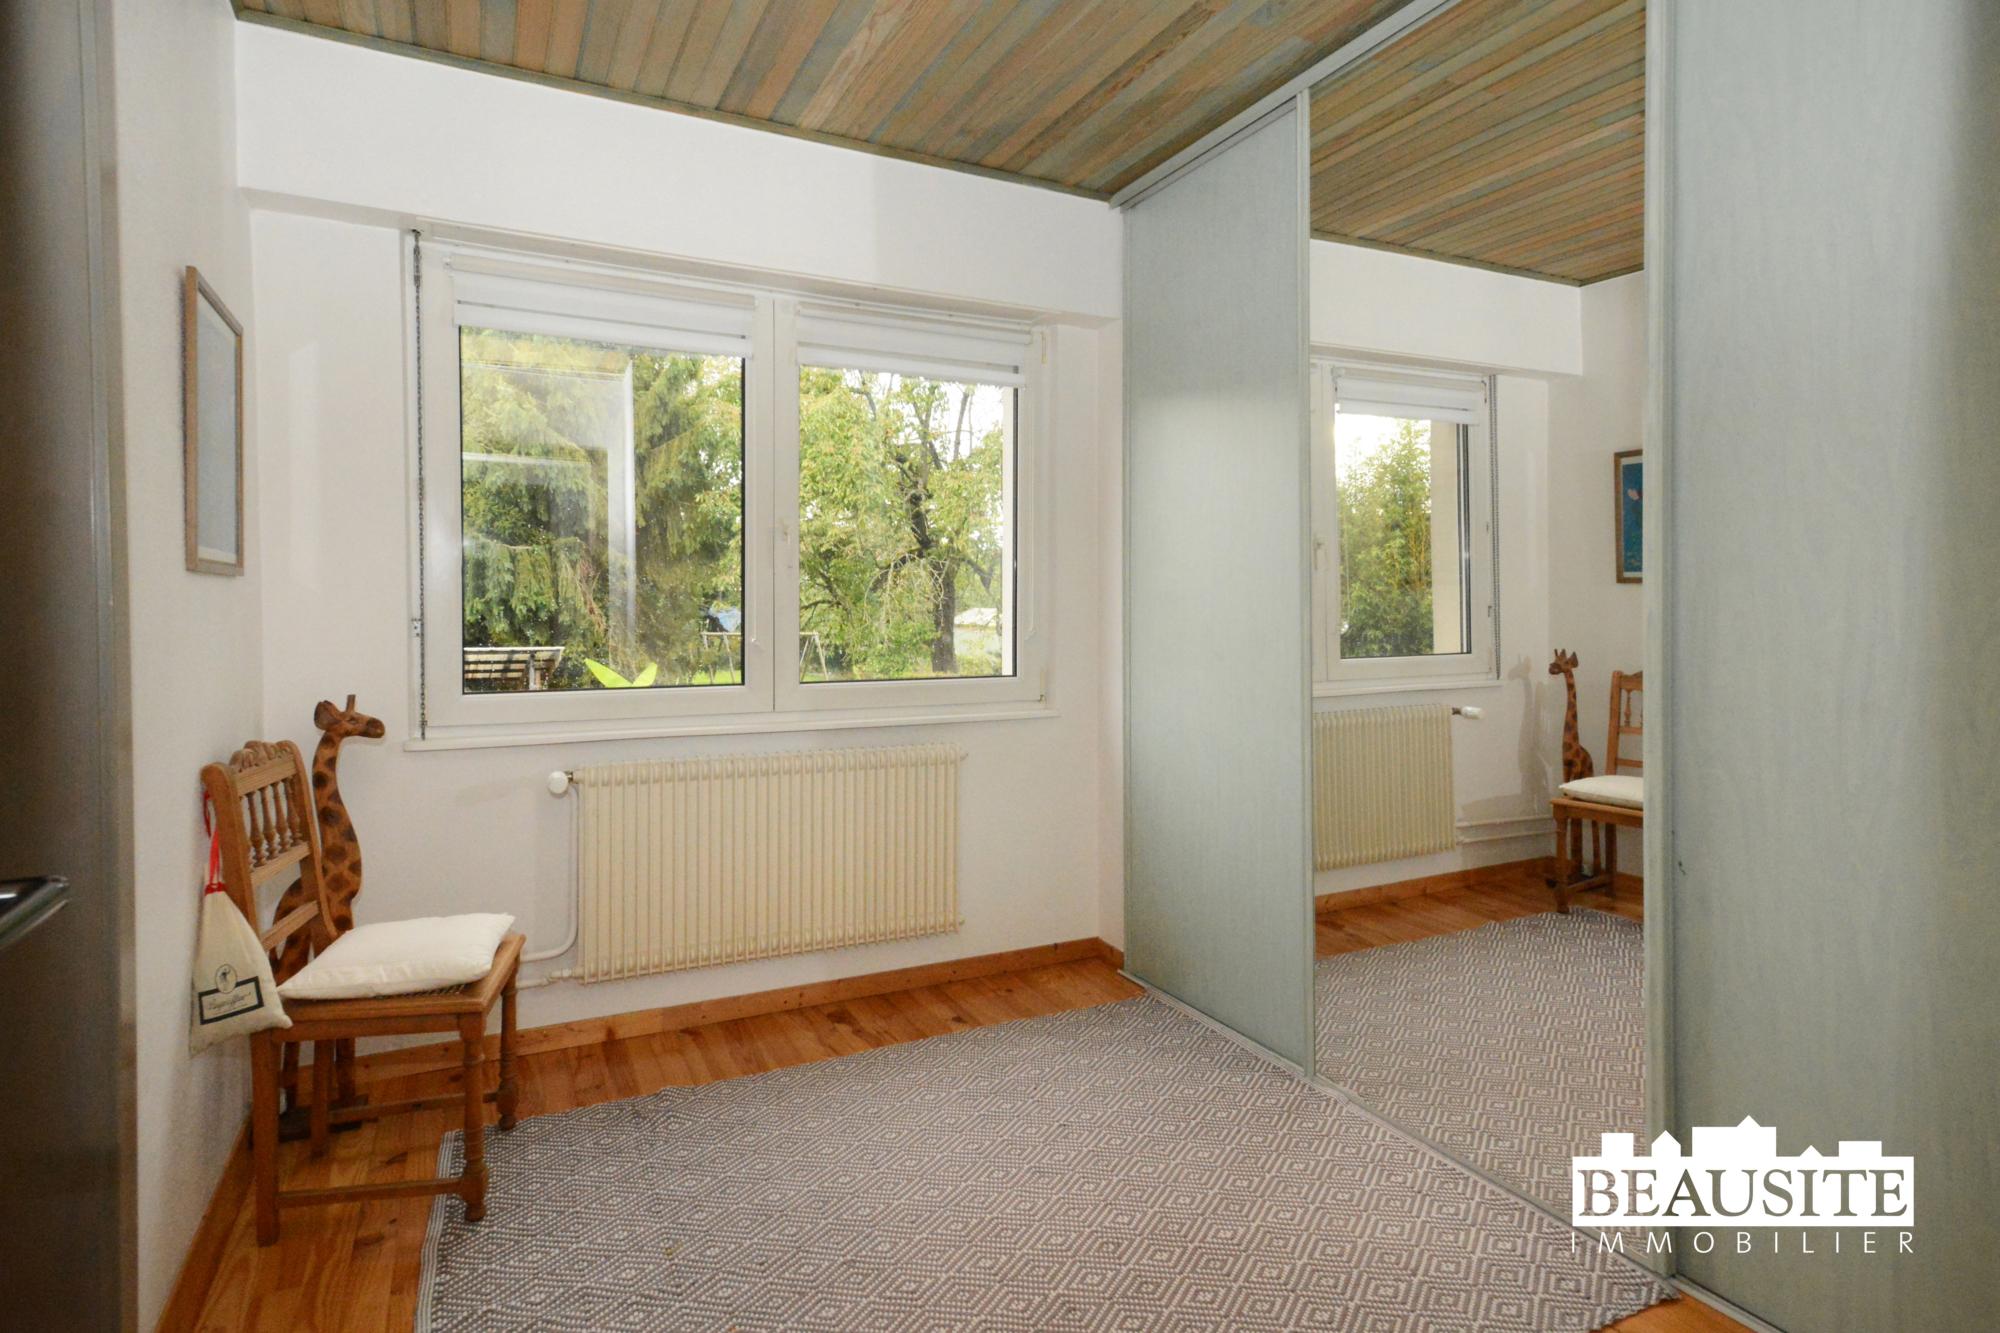 [Haddock] Une superbe maison avec piscine en plein cœur du village - Weyersheim - nos ventes - Beausite Immobilier 6